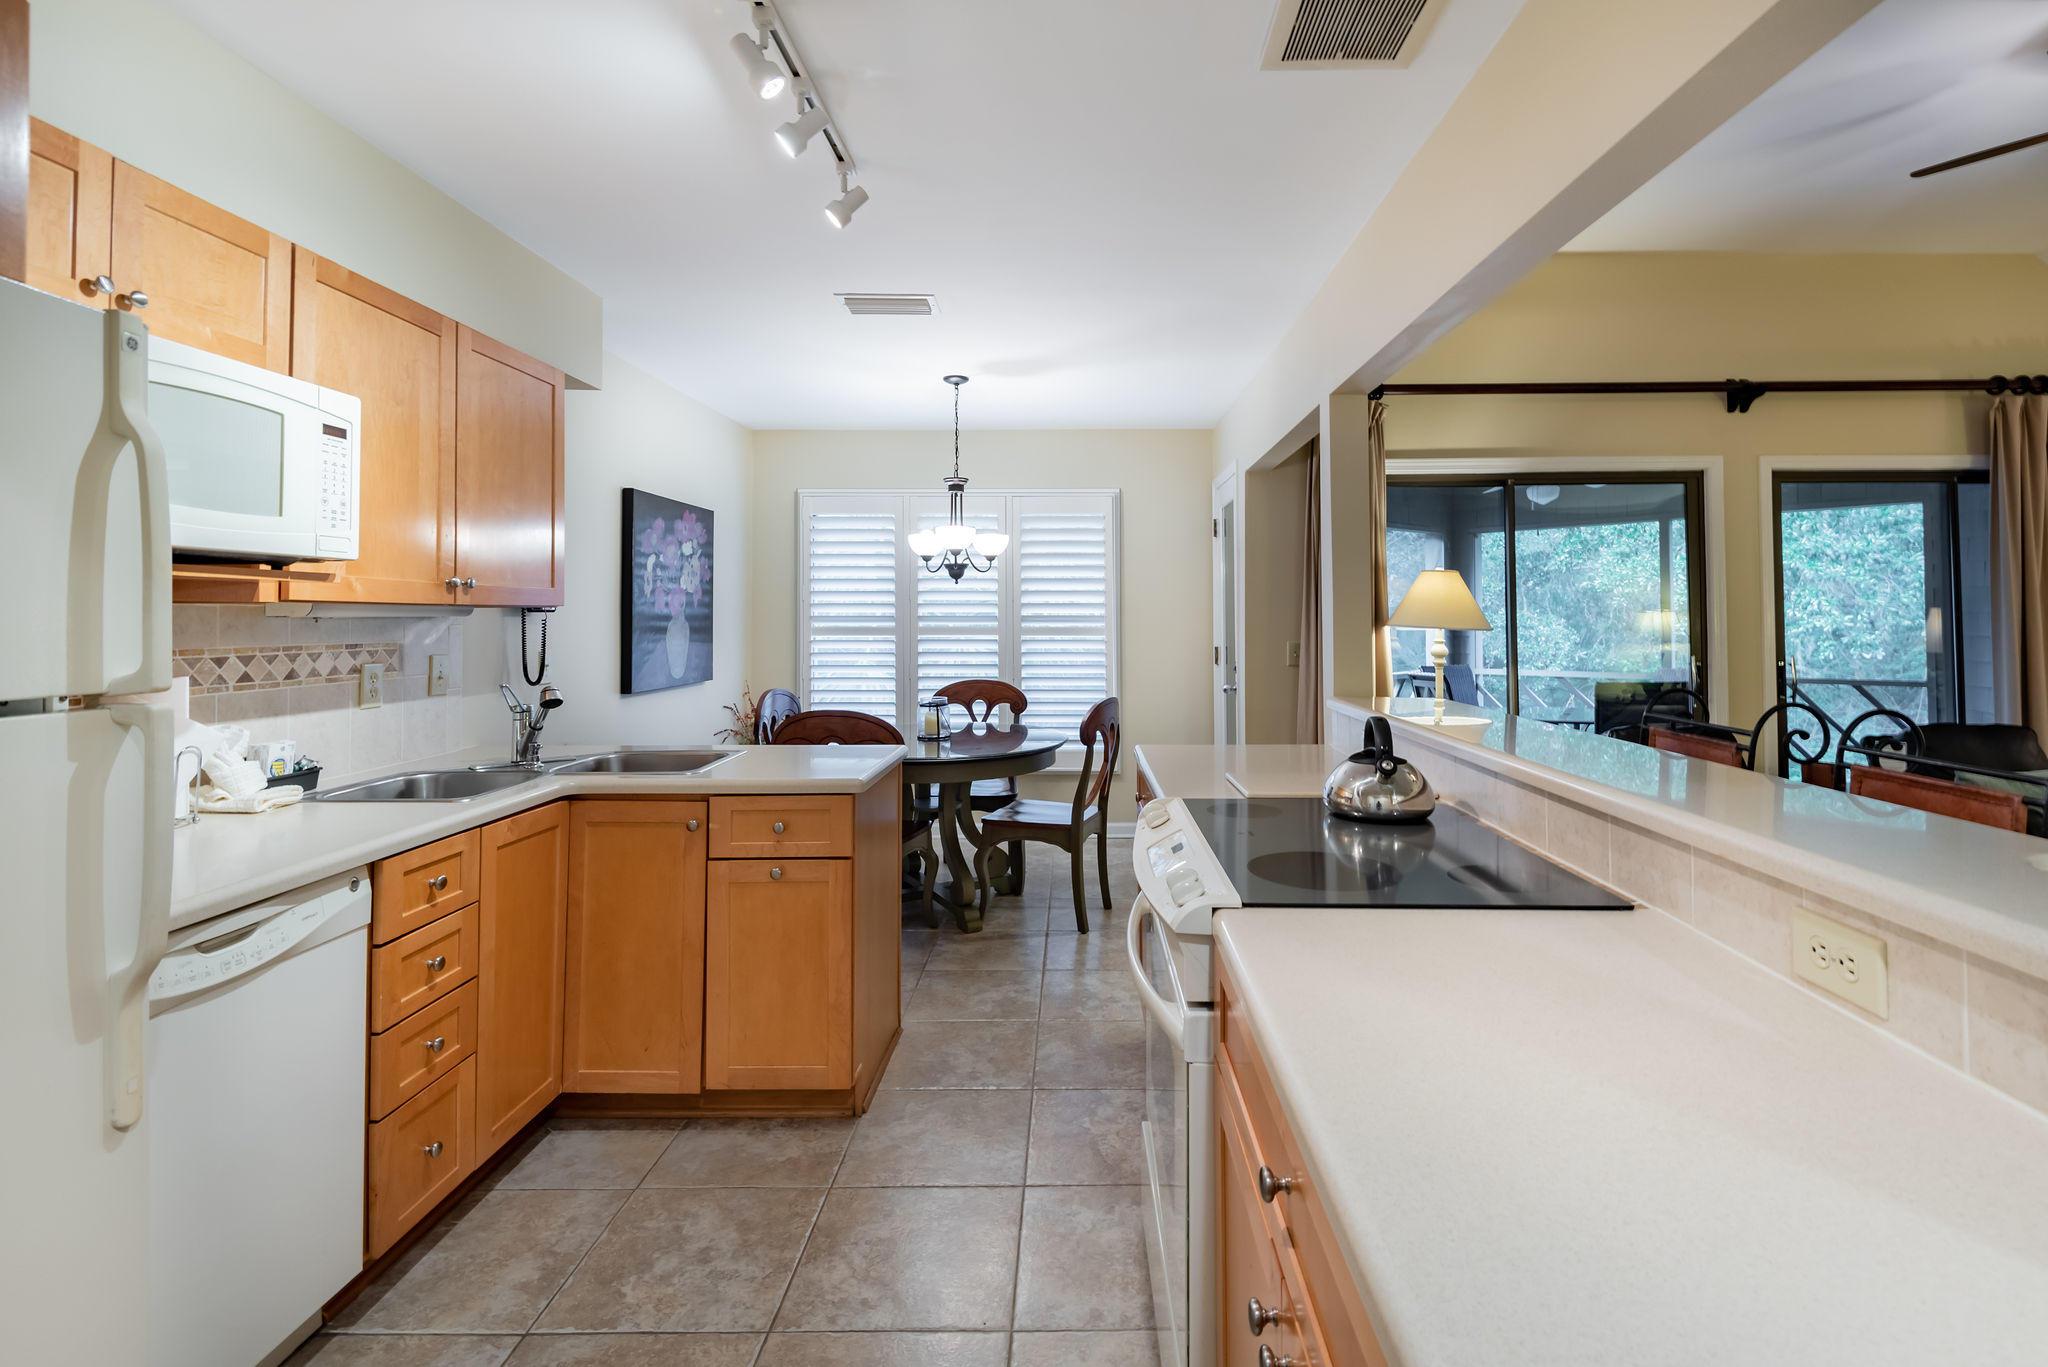 Kiawah Island Homes For Sale - 4660 Tennis Club, Kiawah Island, SC - 12